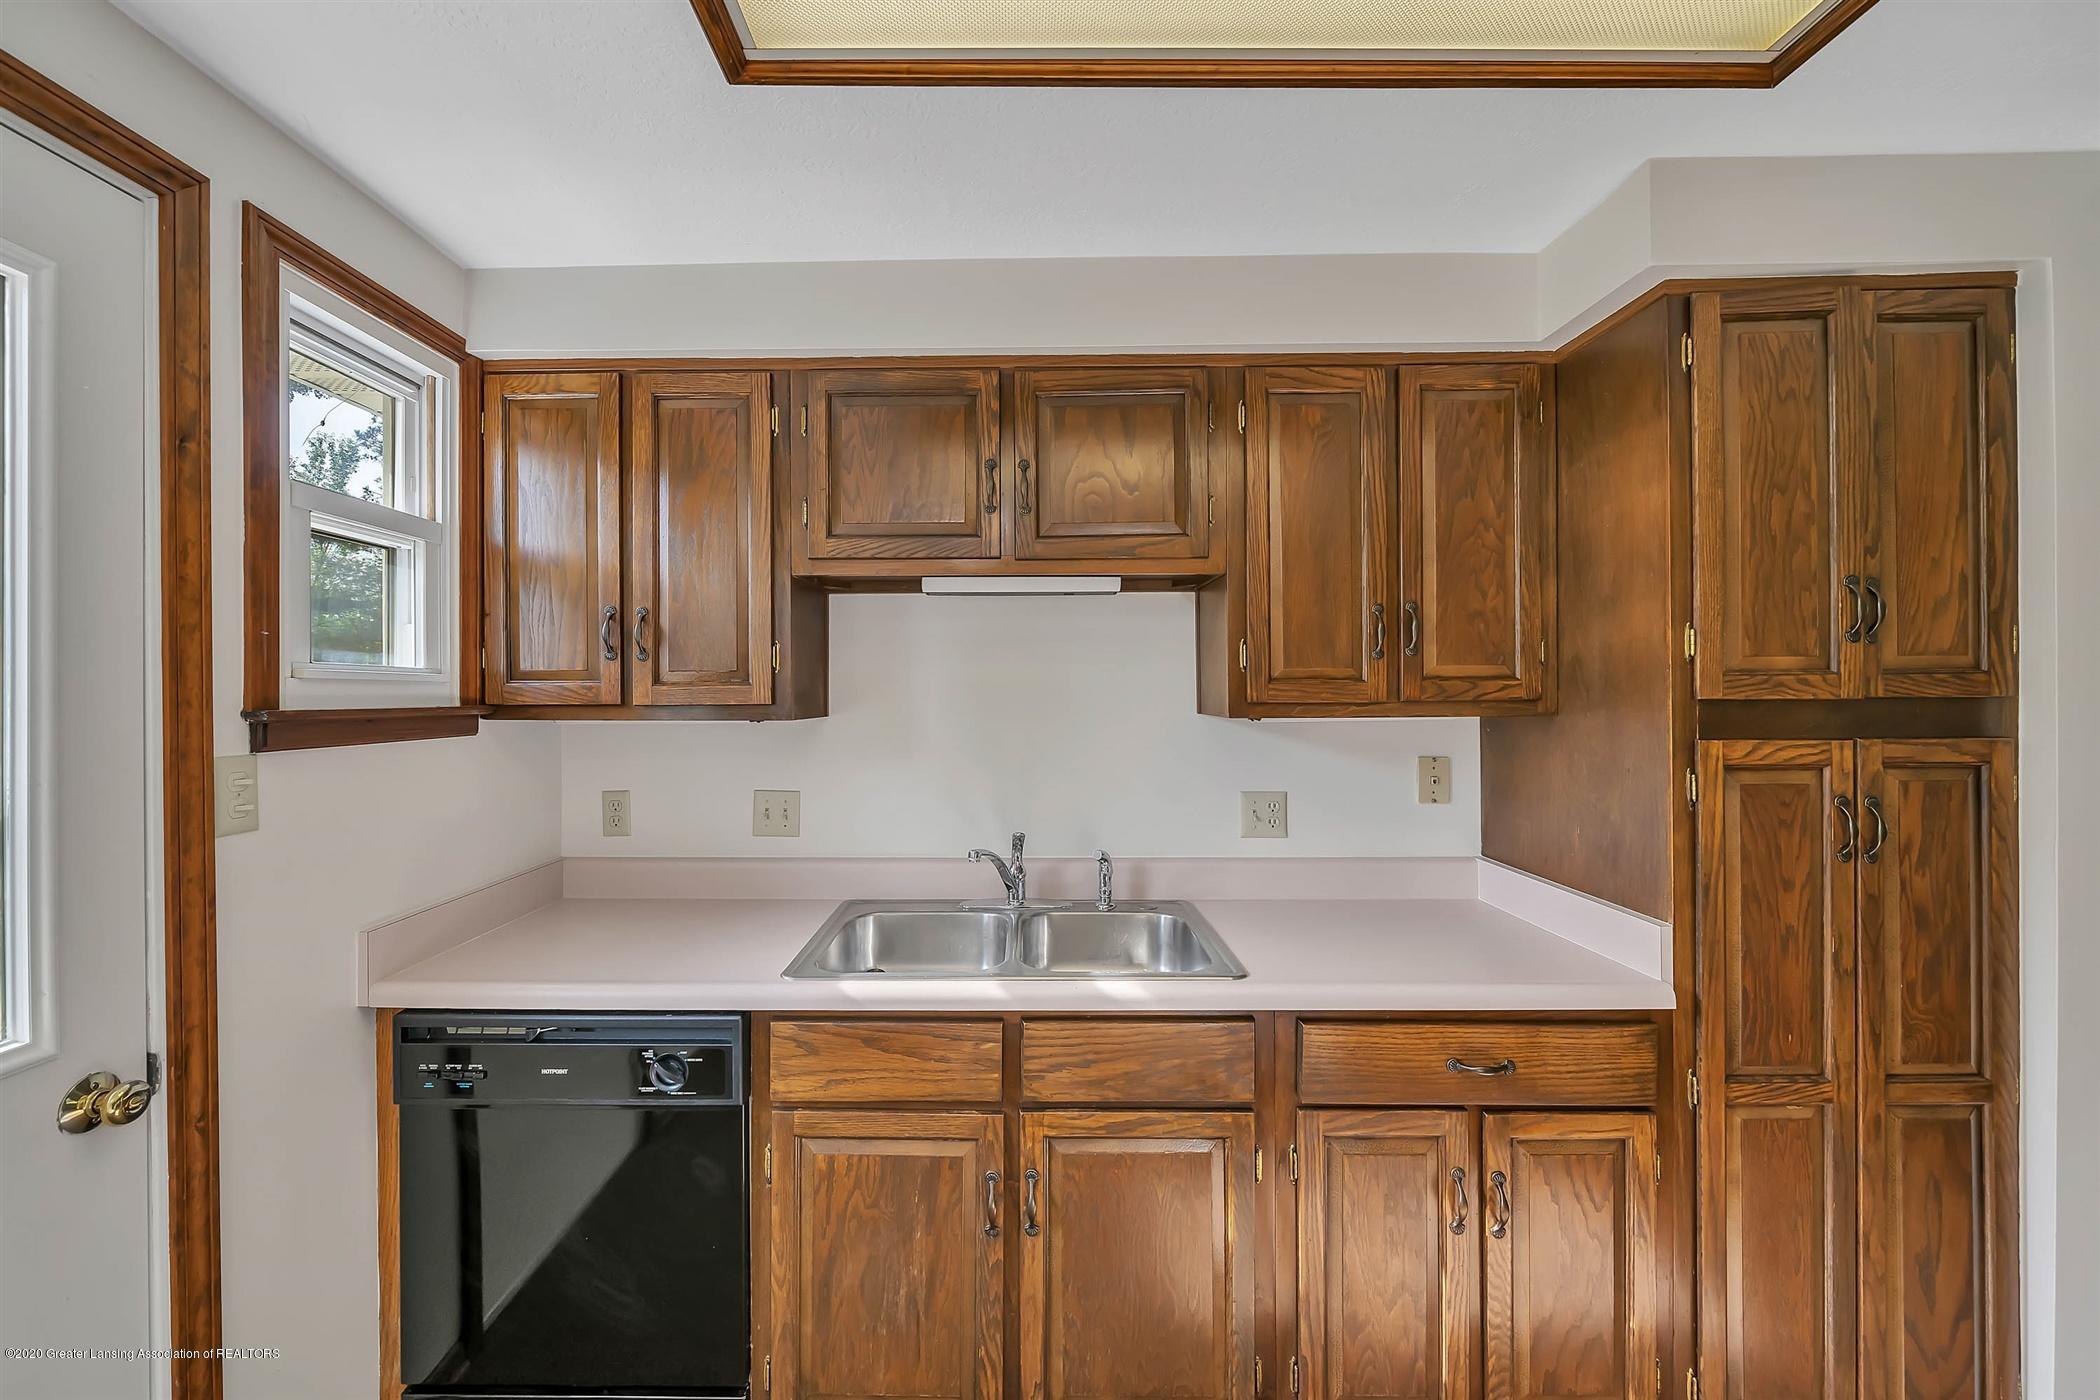 6750 W Lovejoy Rd - (24) 6756 Lovejoy Kitchen - 24